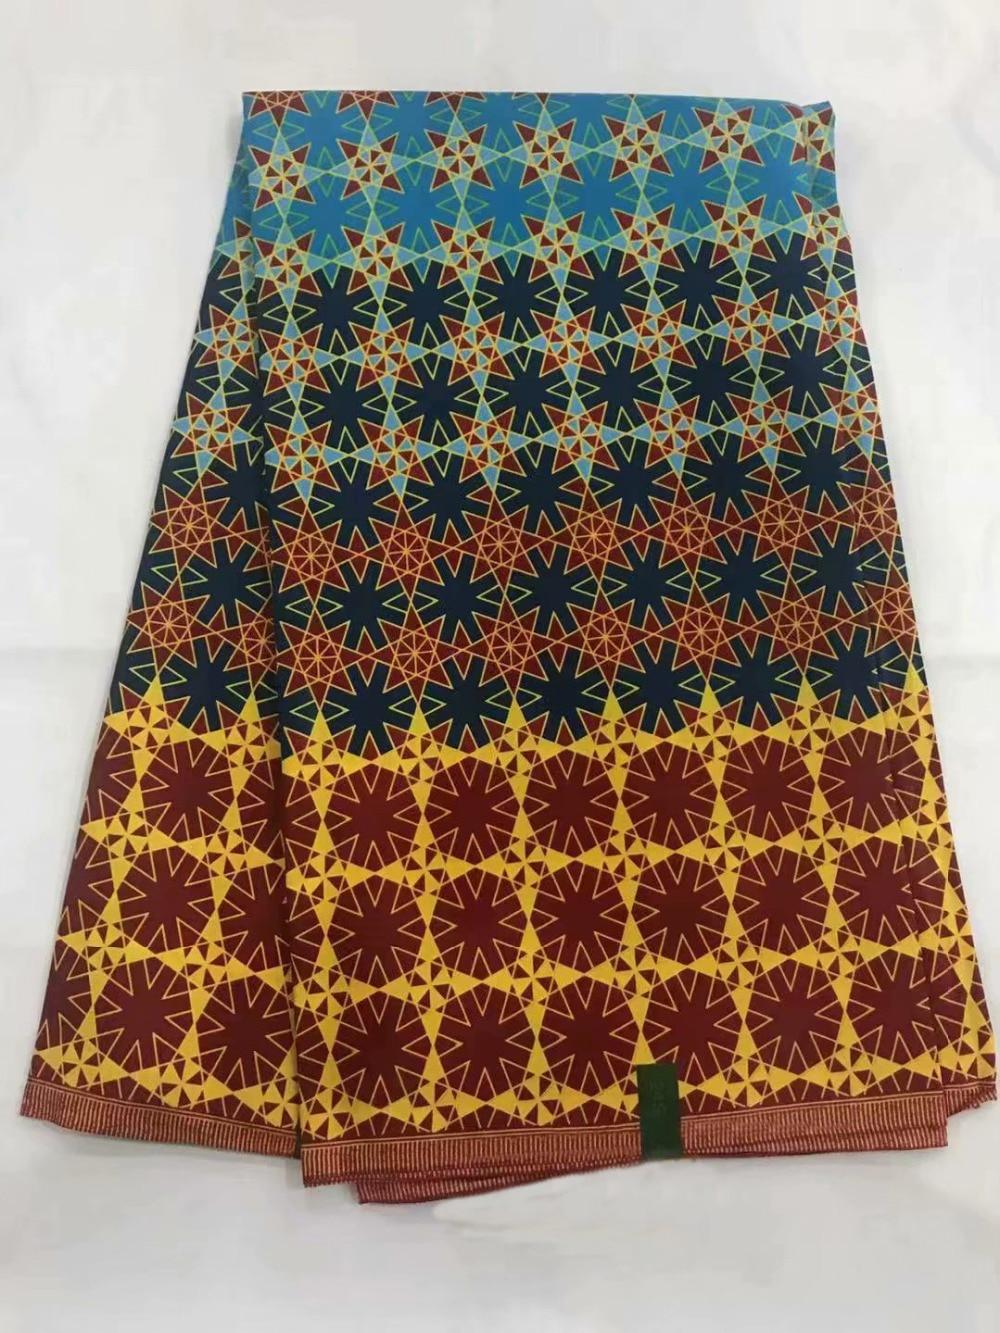 Tissu néerlandais chaud de mode/tissu de cire d'ankara java 6 yards/véritables impressions africaines de bloc de cire de java de coton 100% en gros! OT-3900